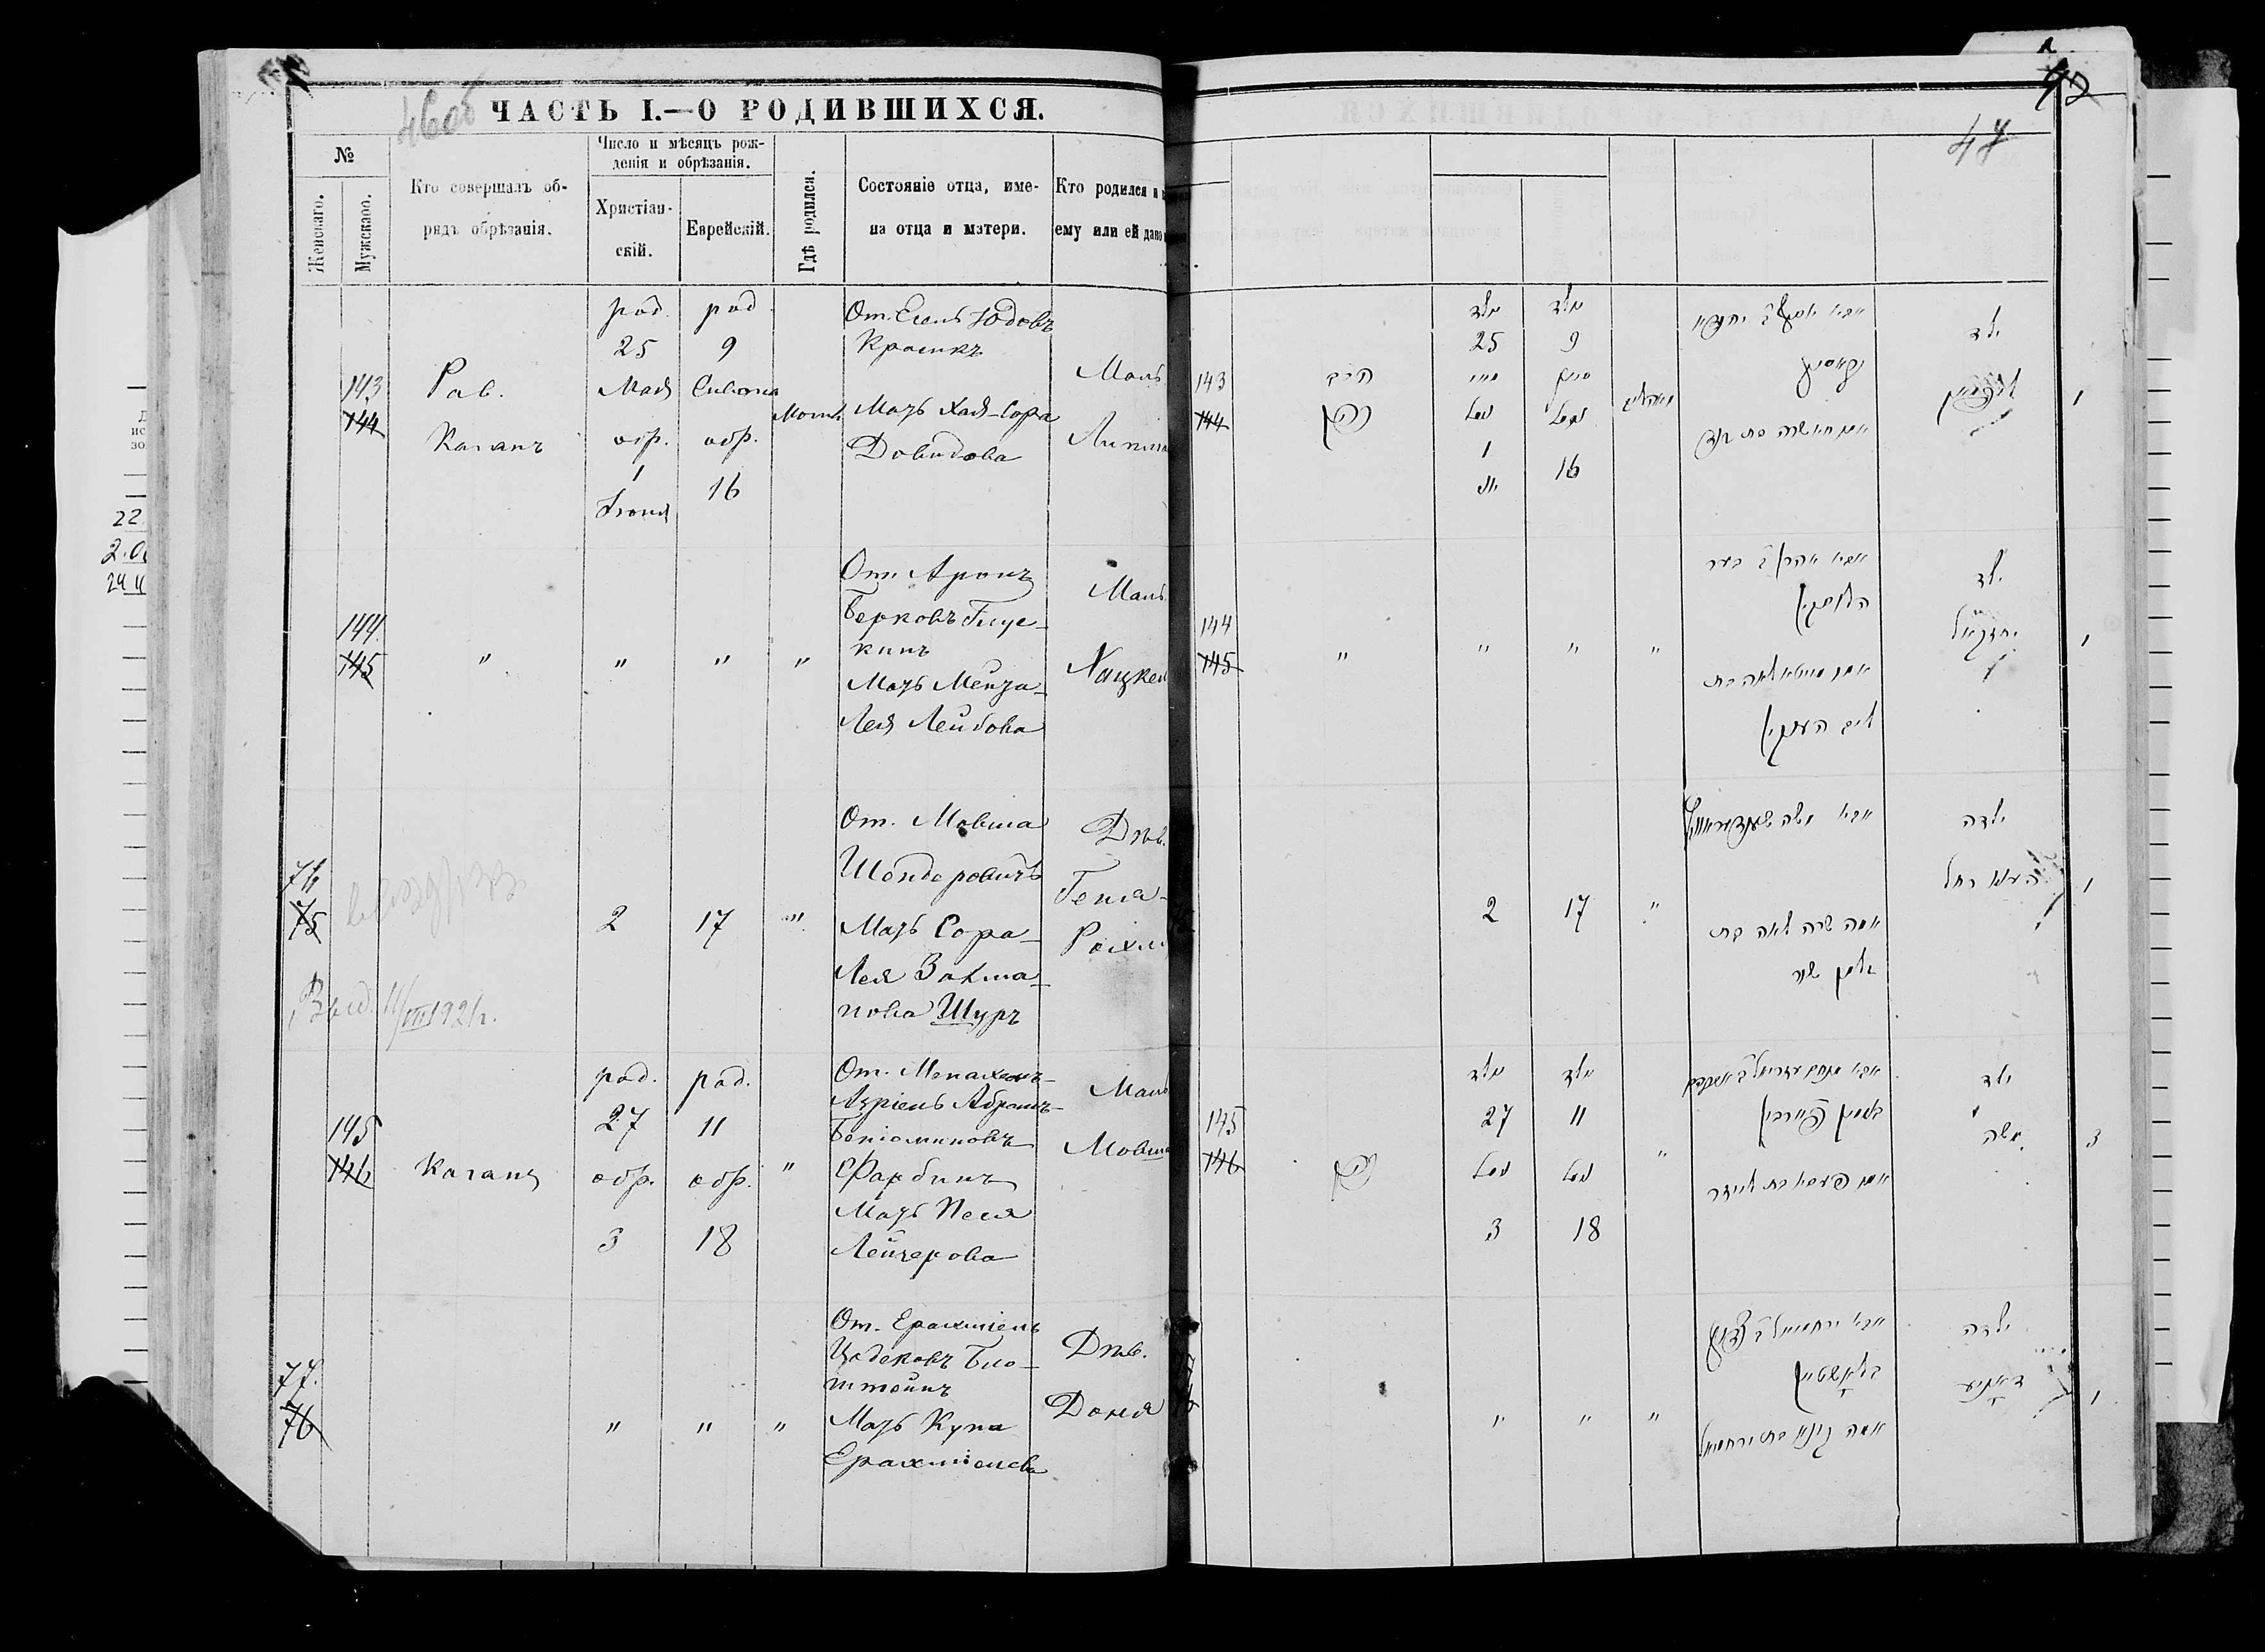 Геня-Рохля Шендерович 2 мая 1881, запись 76, пленка 007766482, снимок 551